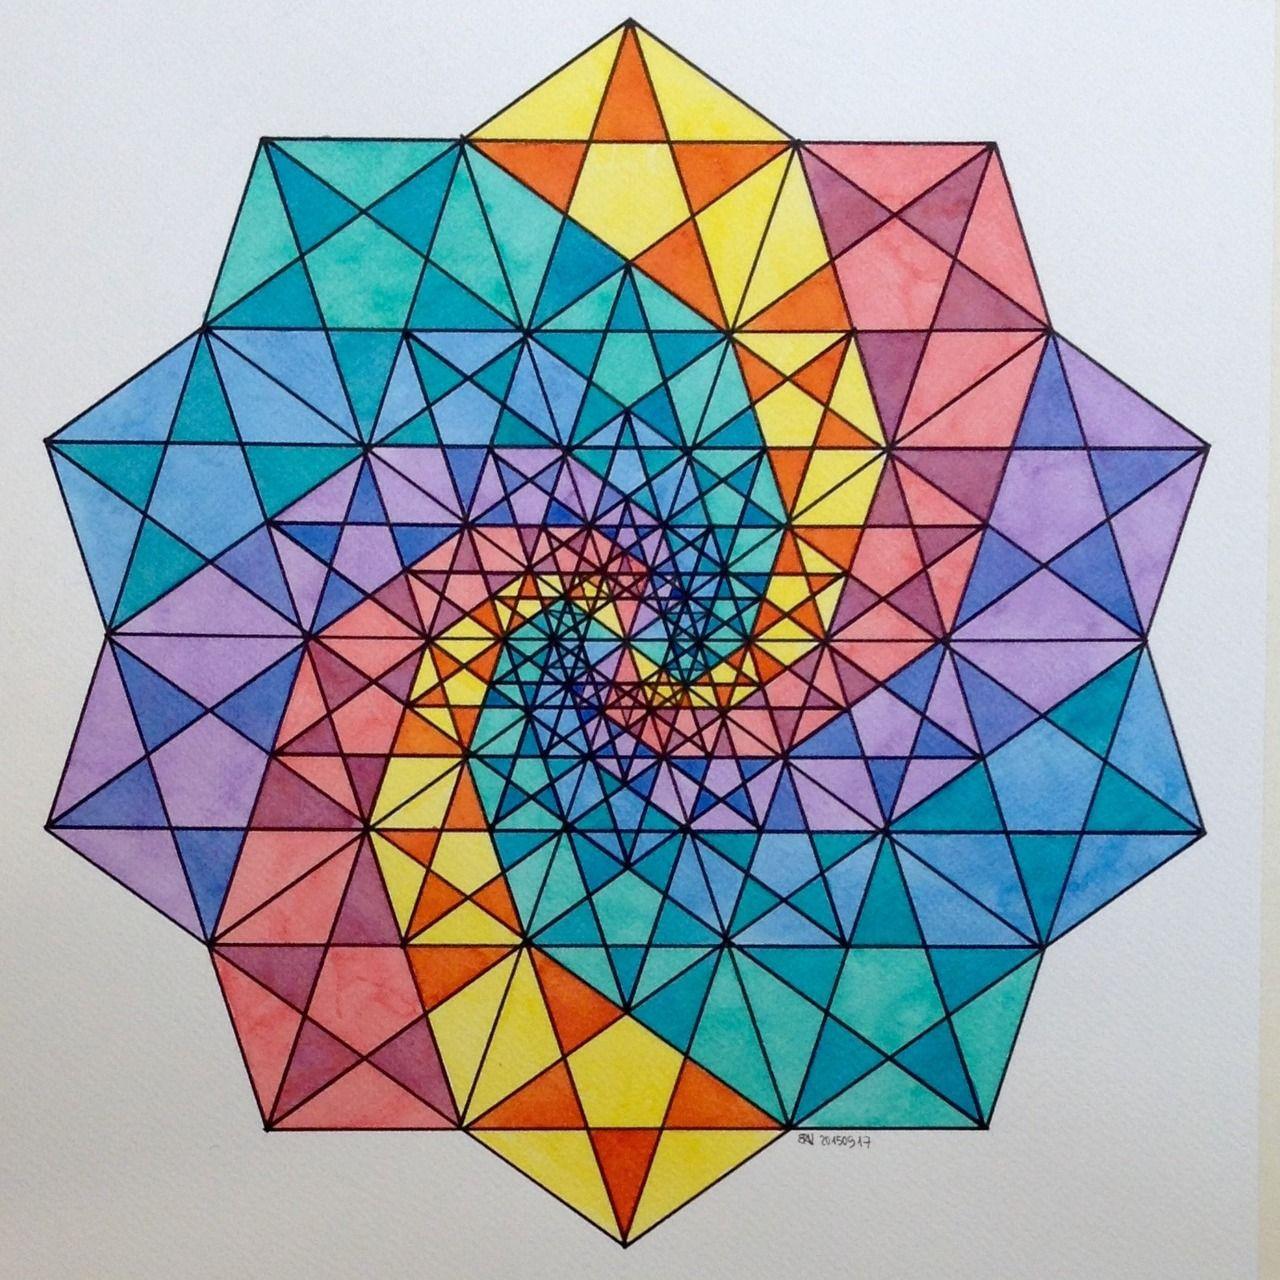 10 geometric art explorations for math learning - 960×960